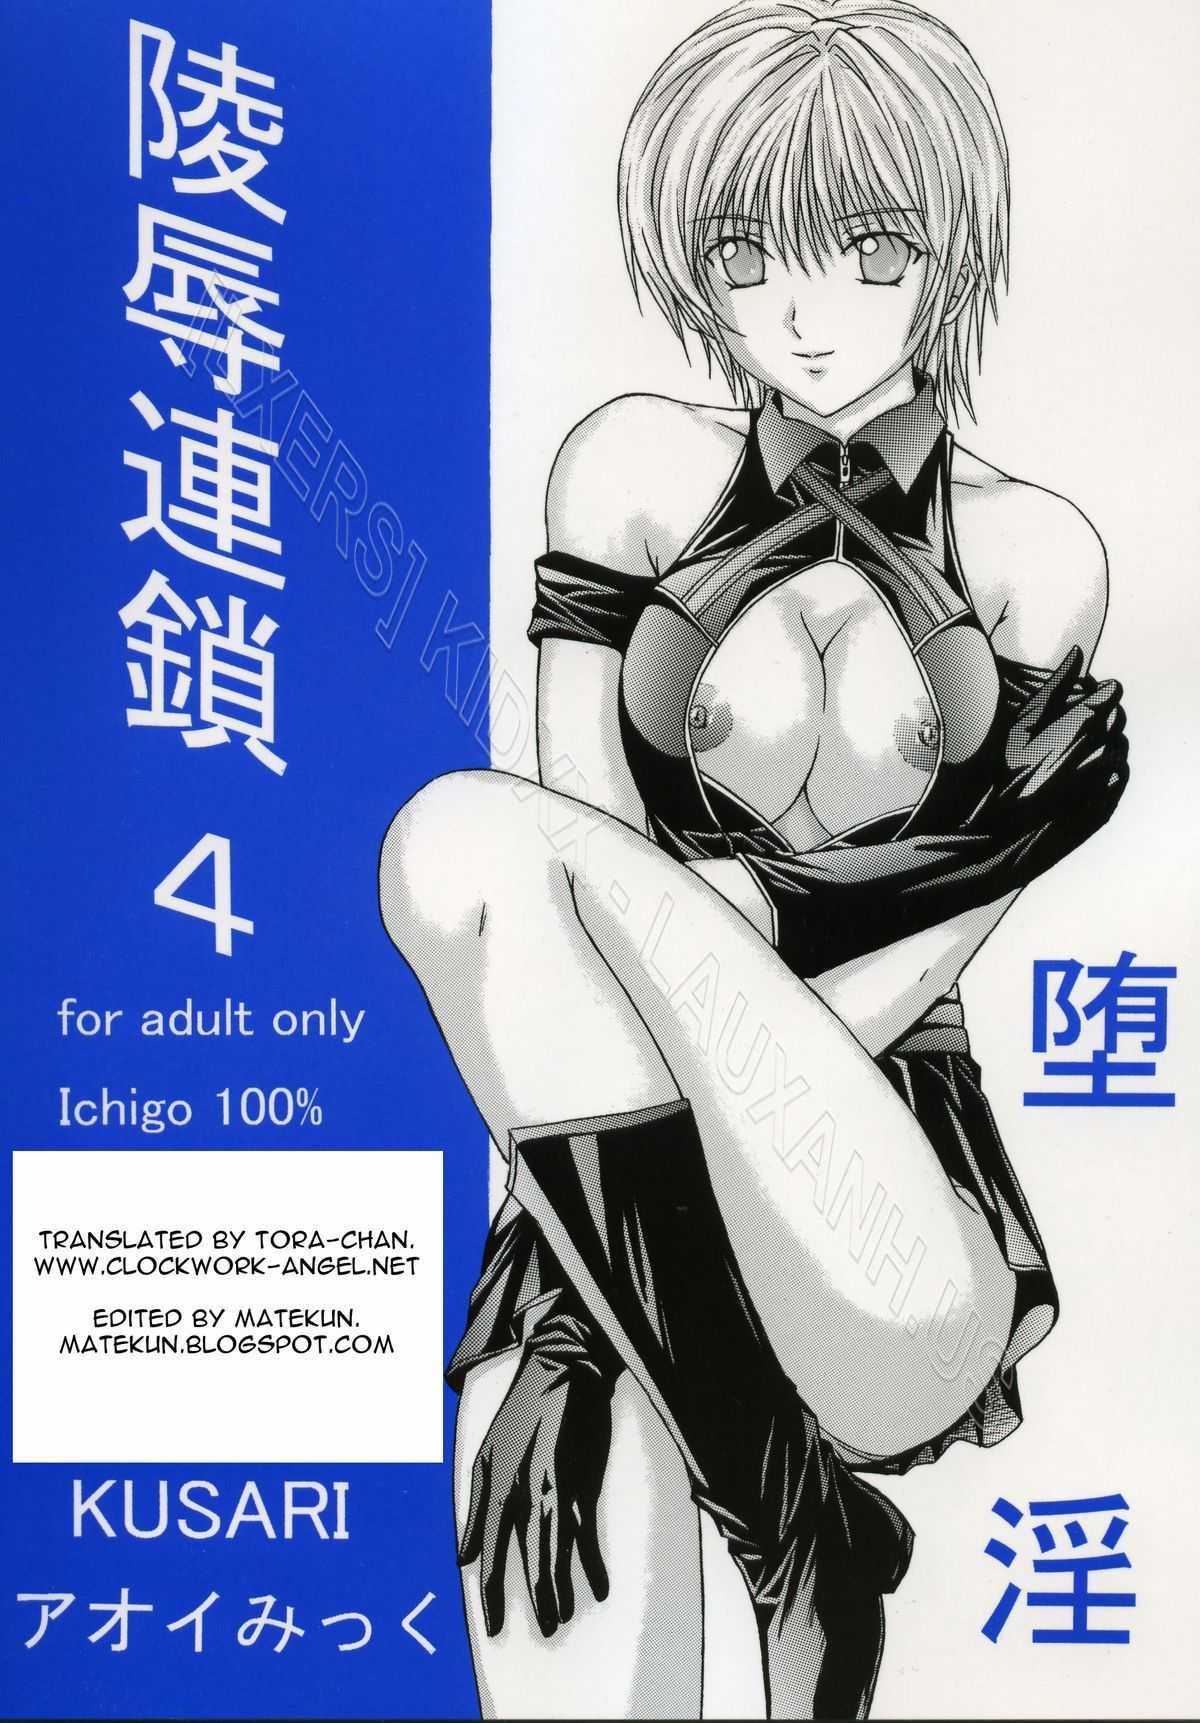 TruyenHay.Com - Ảnh 34 - Ryoujoku Rensa Chapter 4